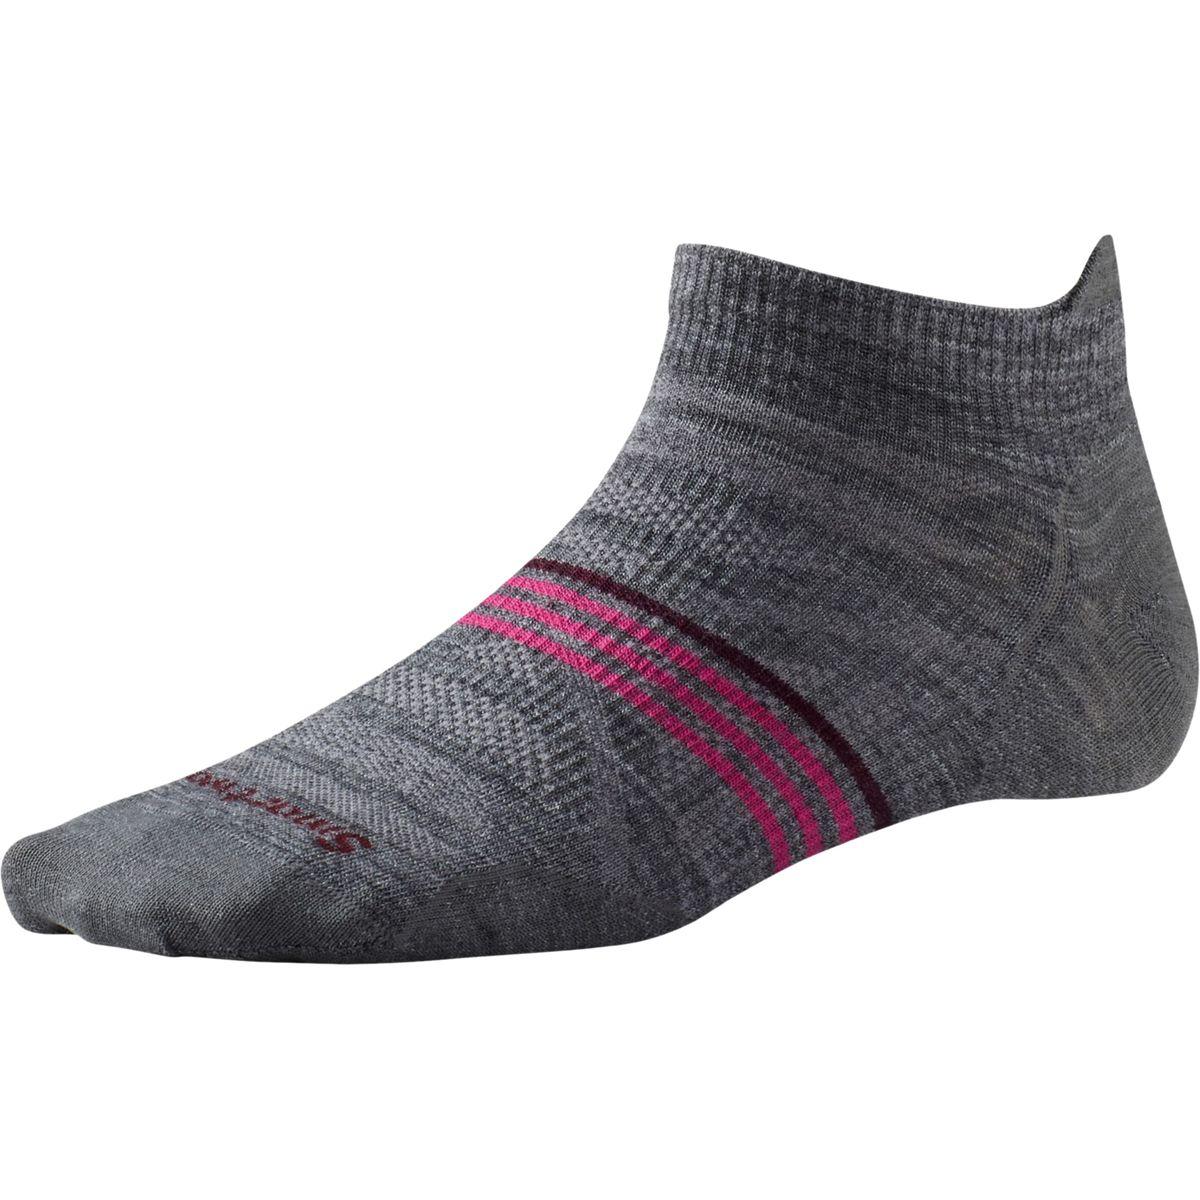 photo: Smartwool Women's PhD Outdoor Ultra Light Micro Sock running sock